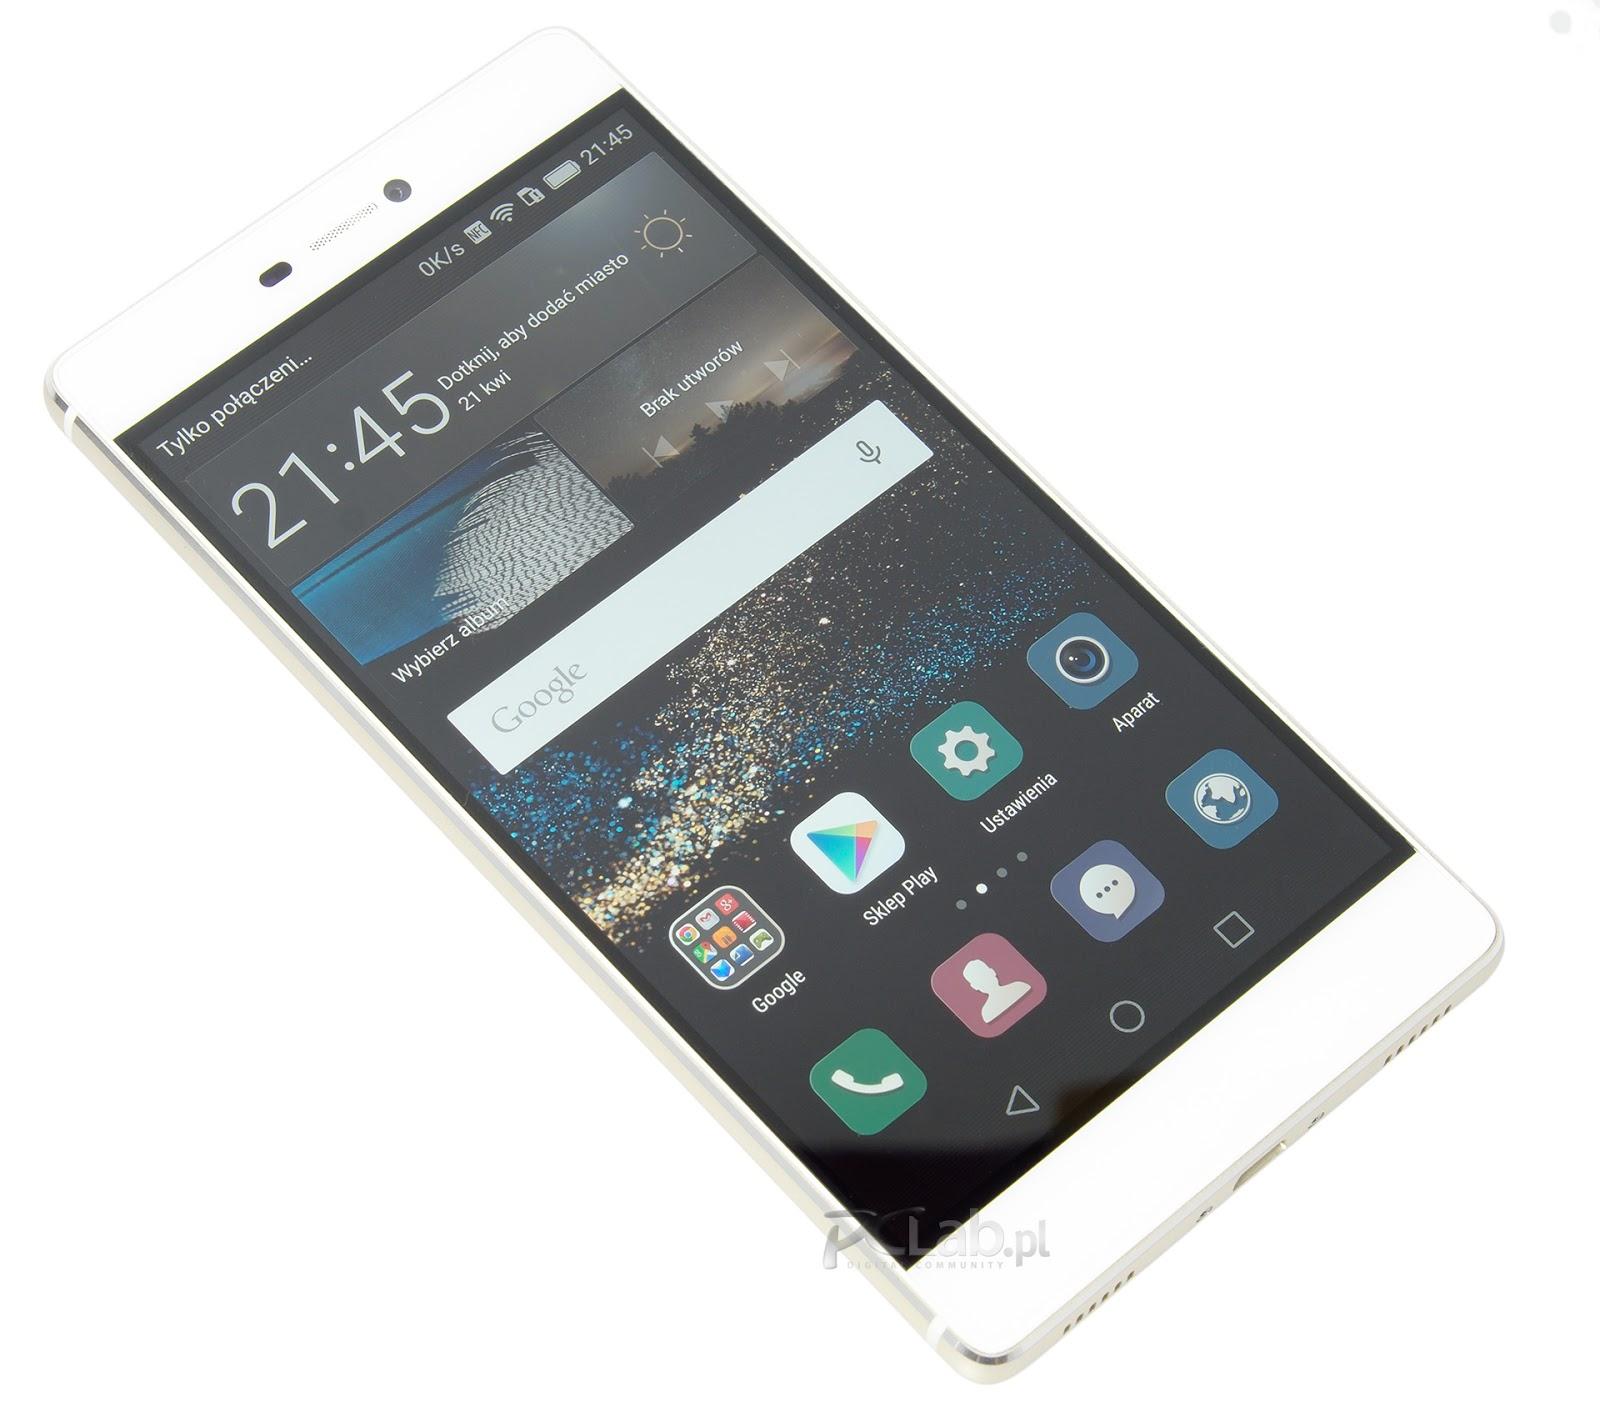 How to Update Huawei P8 GRA-L09 [Magyar Telekom] to Stock ...